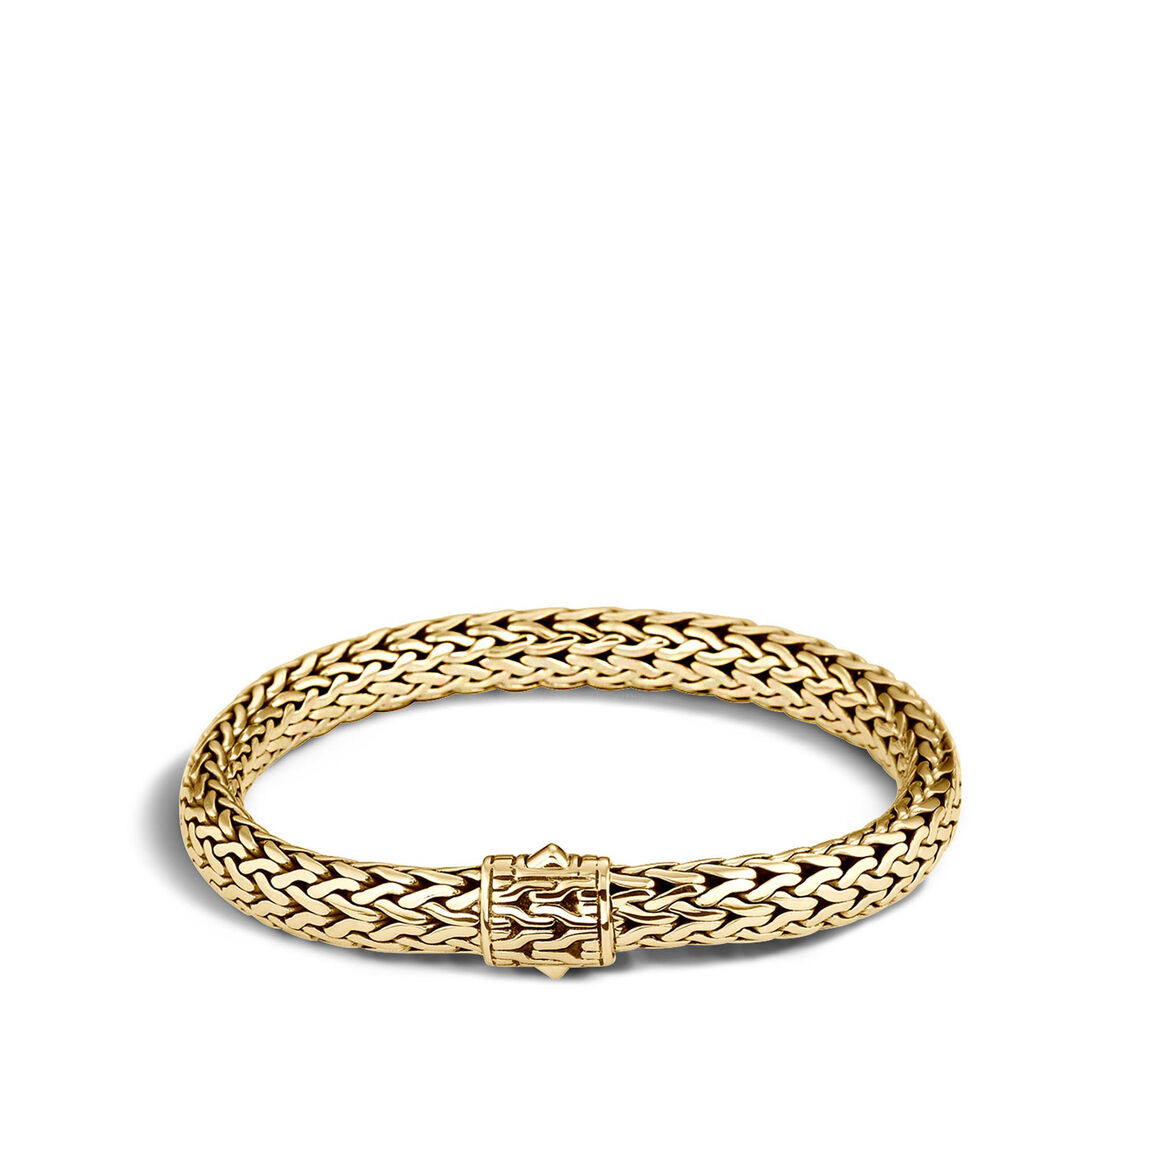 Classic Chain 7.5MM Bracelet in 18K Gold